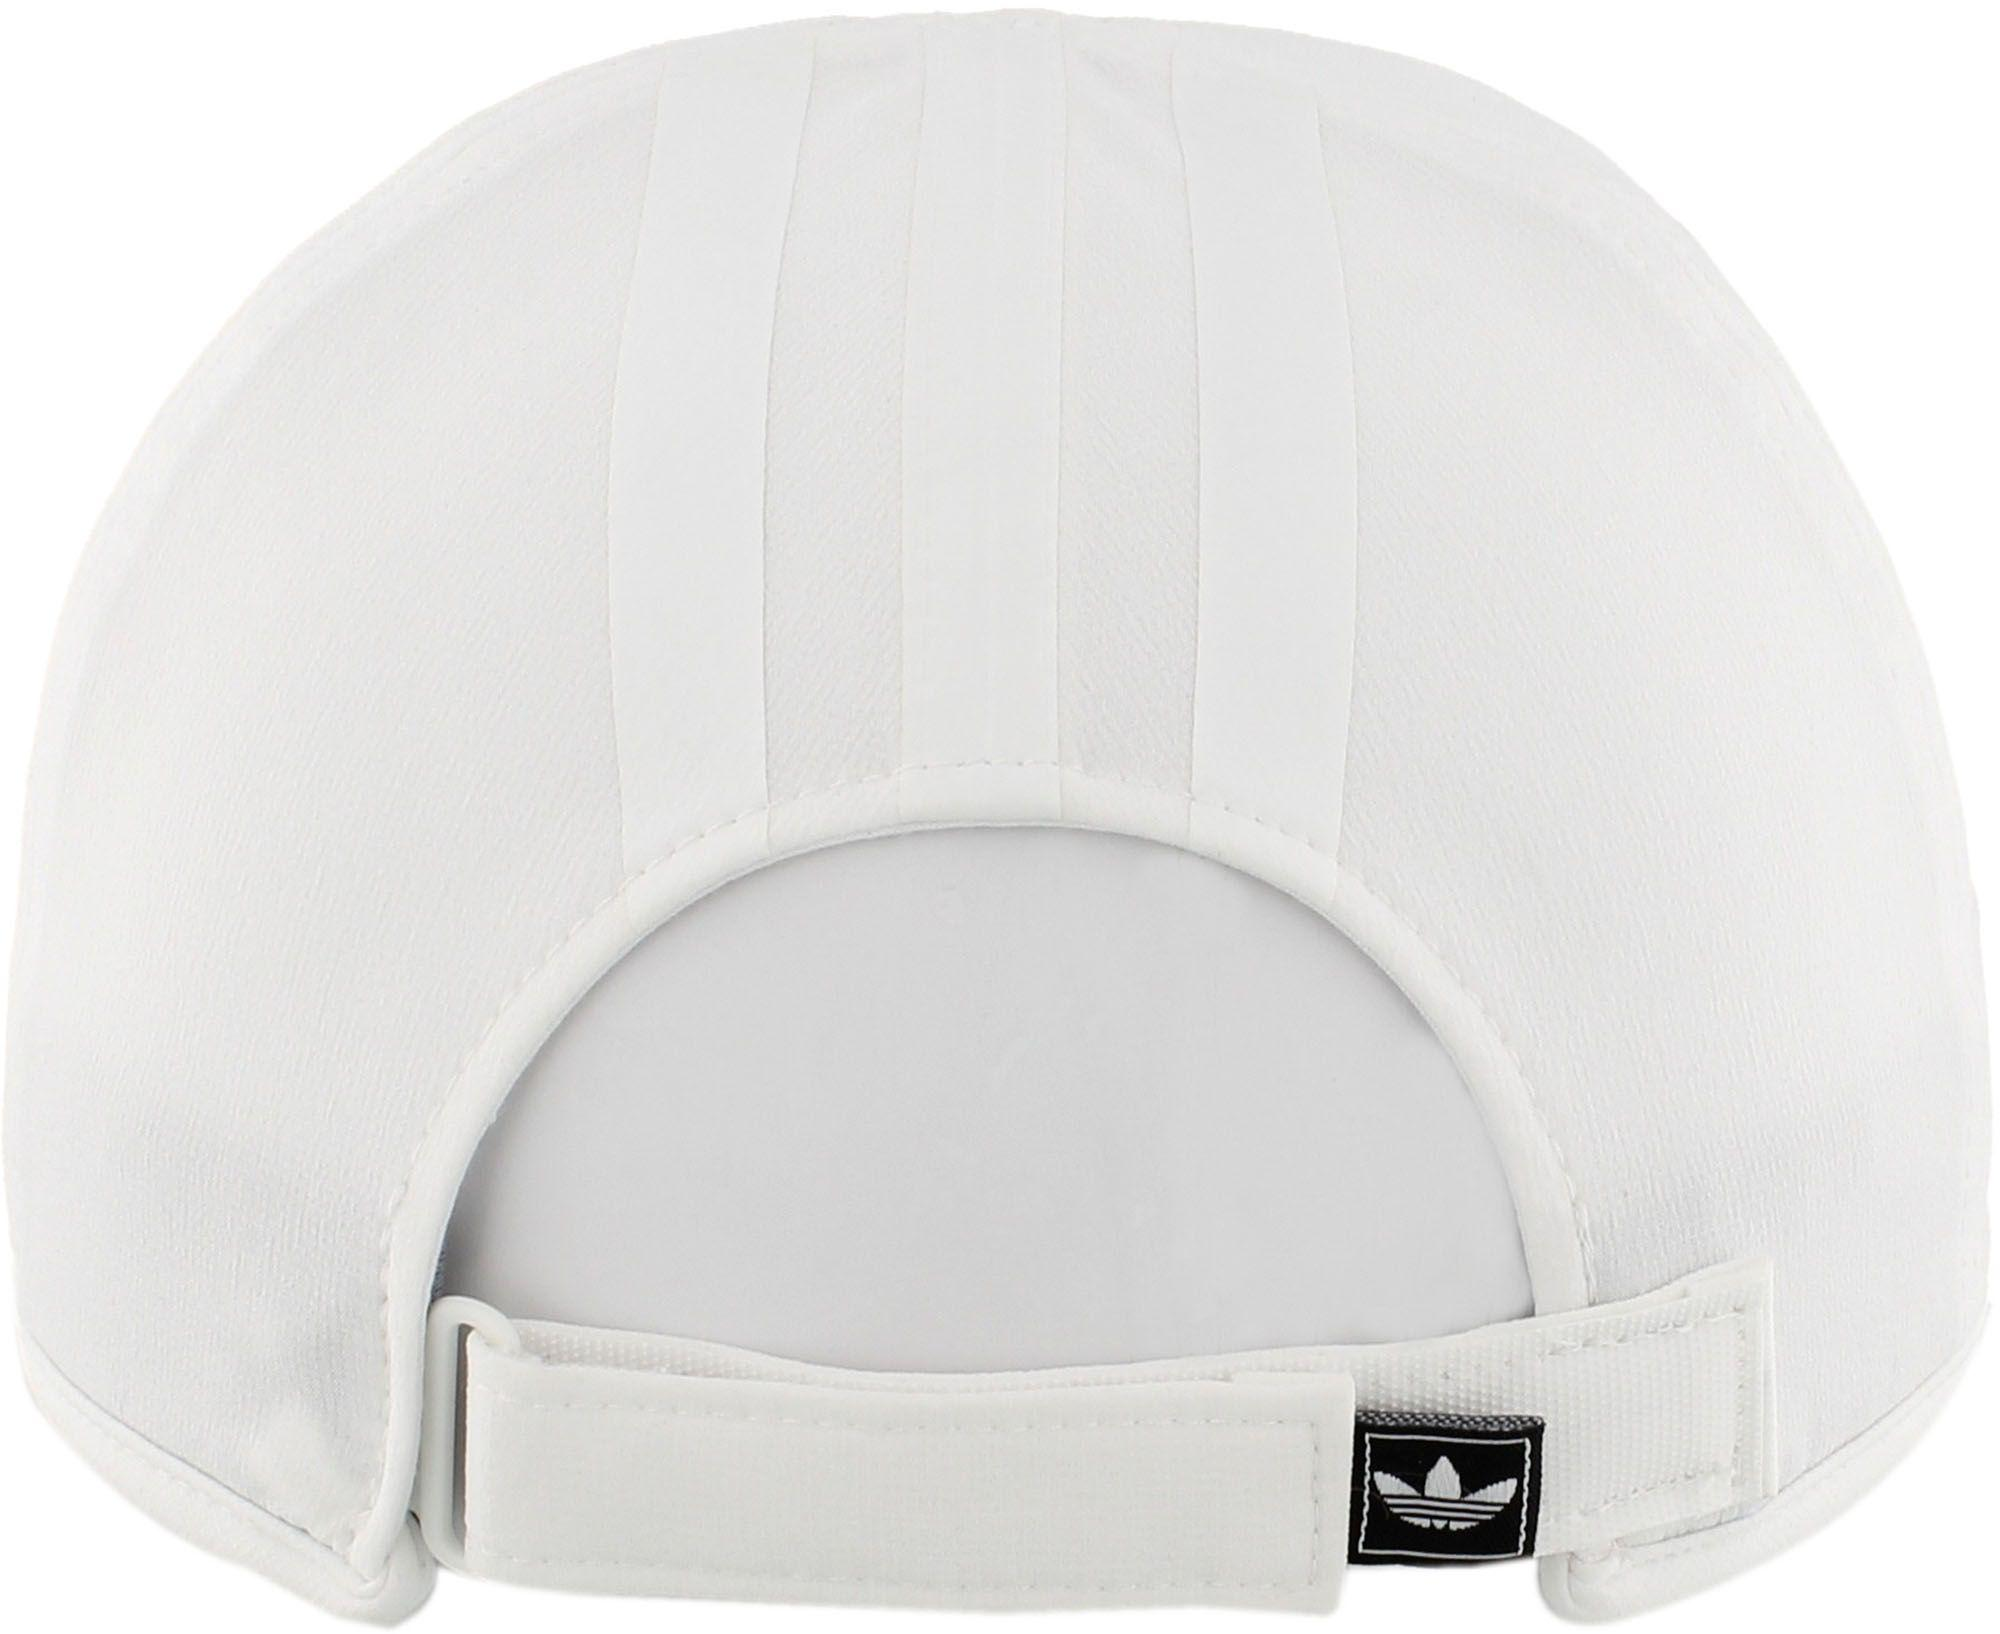 193c018a4cb Lyst - adidas Originals Eqt Trainer Ii Hat in White for Men